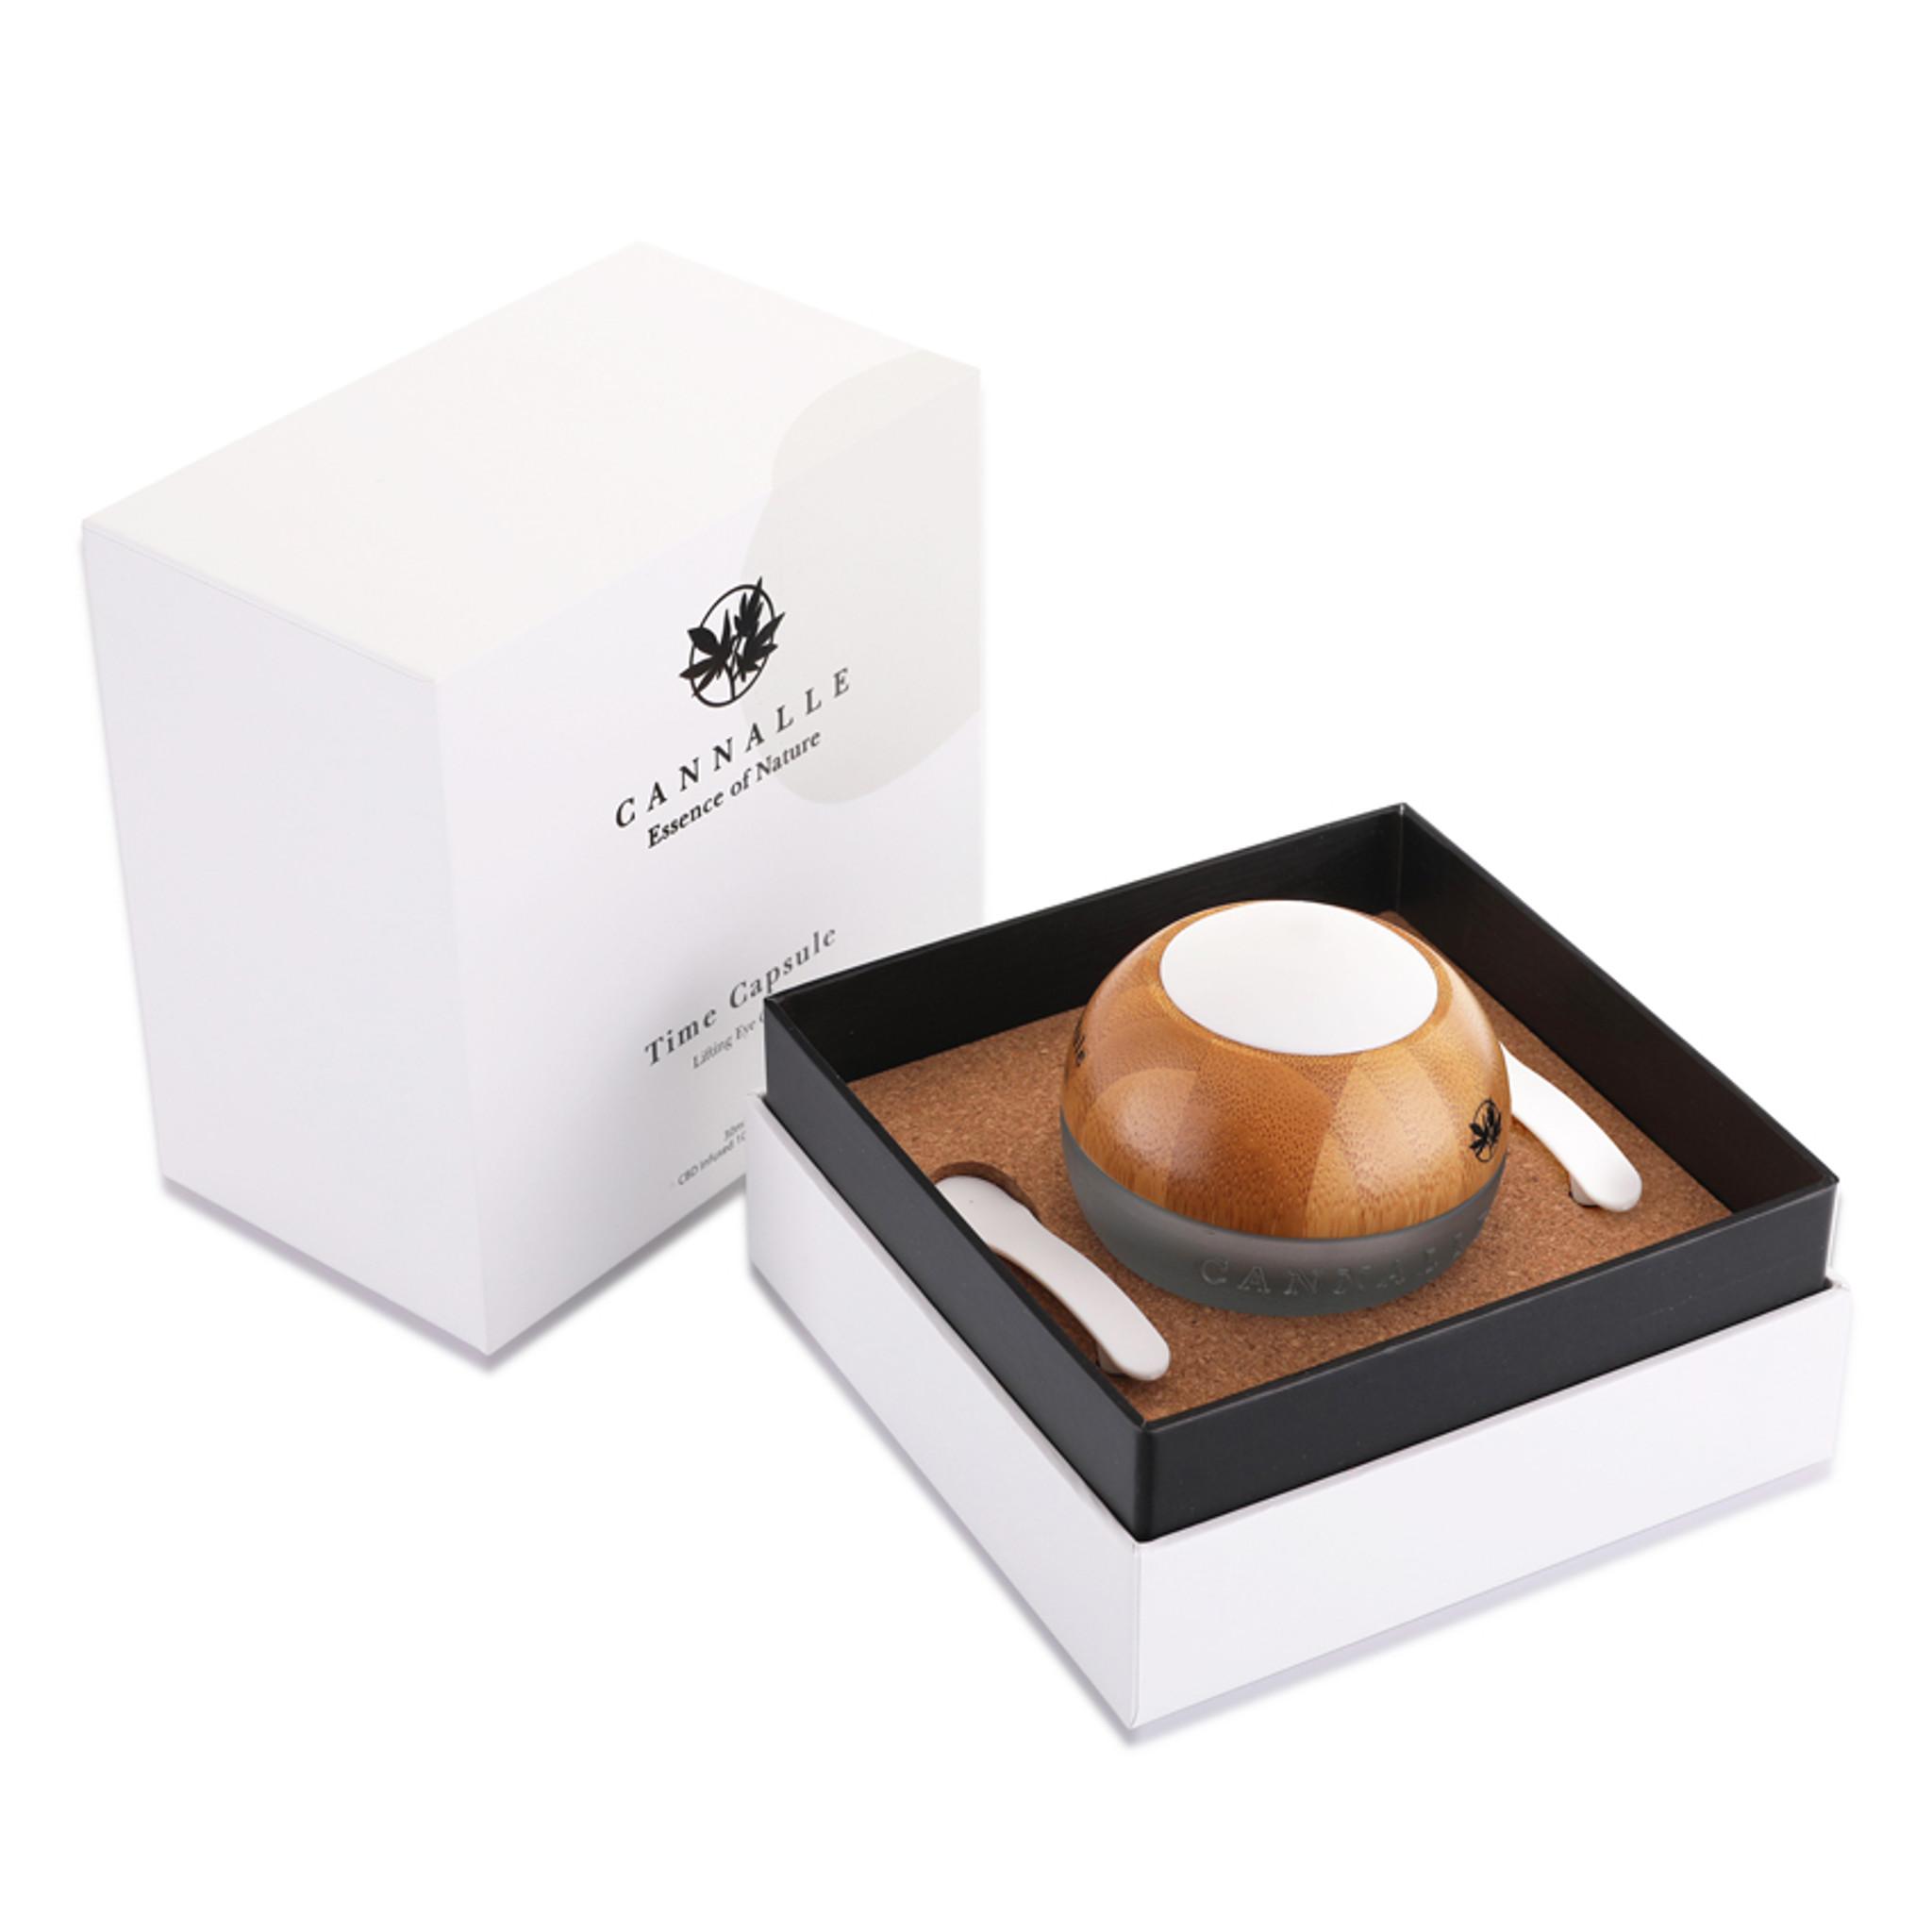 Time Capsule™ - Lifting Eye Cream - CBD Infused 1000mg